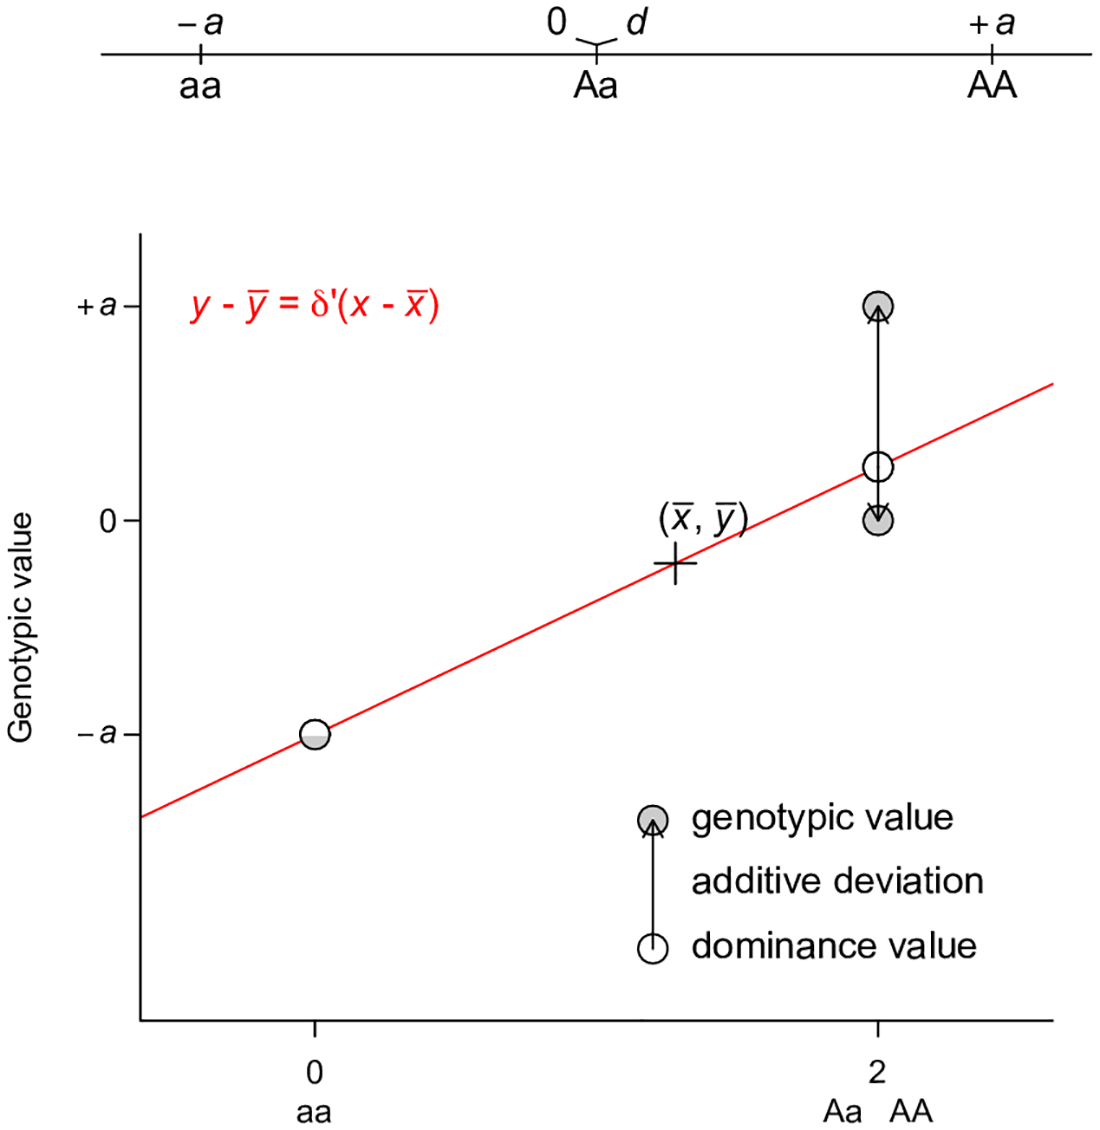 Least squares regression interpretation of VD′.